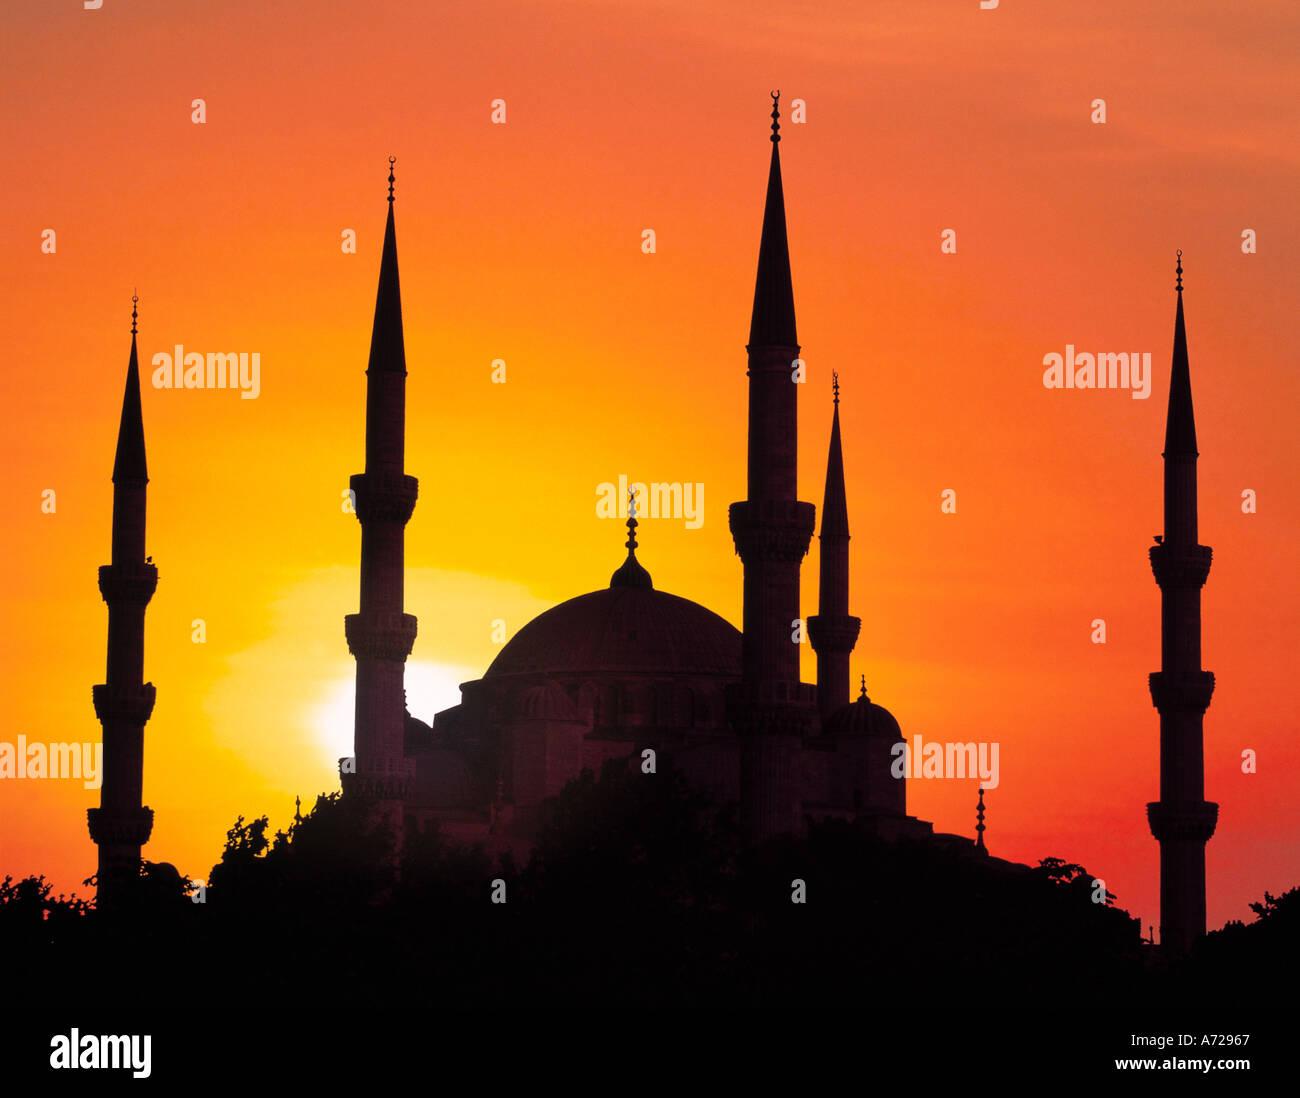 Sultan Ahmet Camii Moschee blaue Moschee in Istanbul Türkei Stockbild